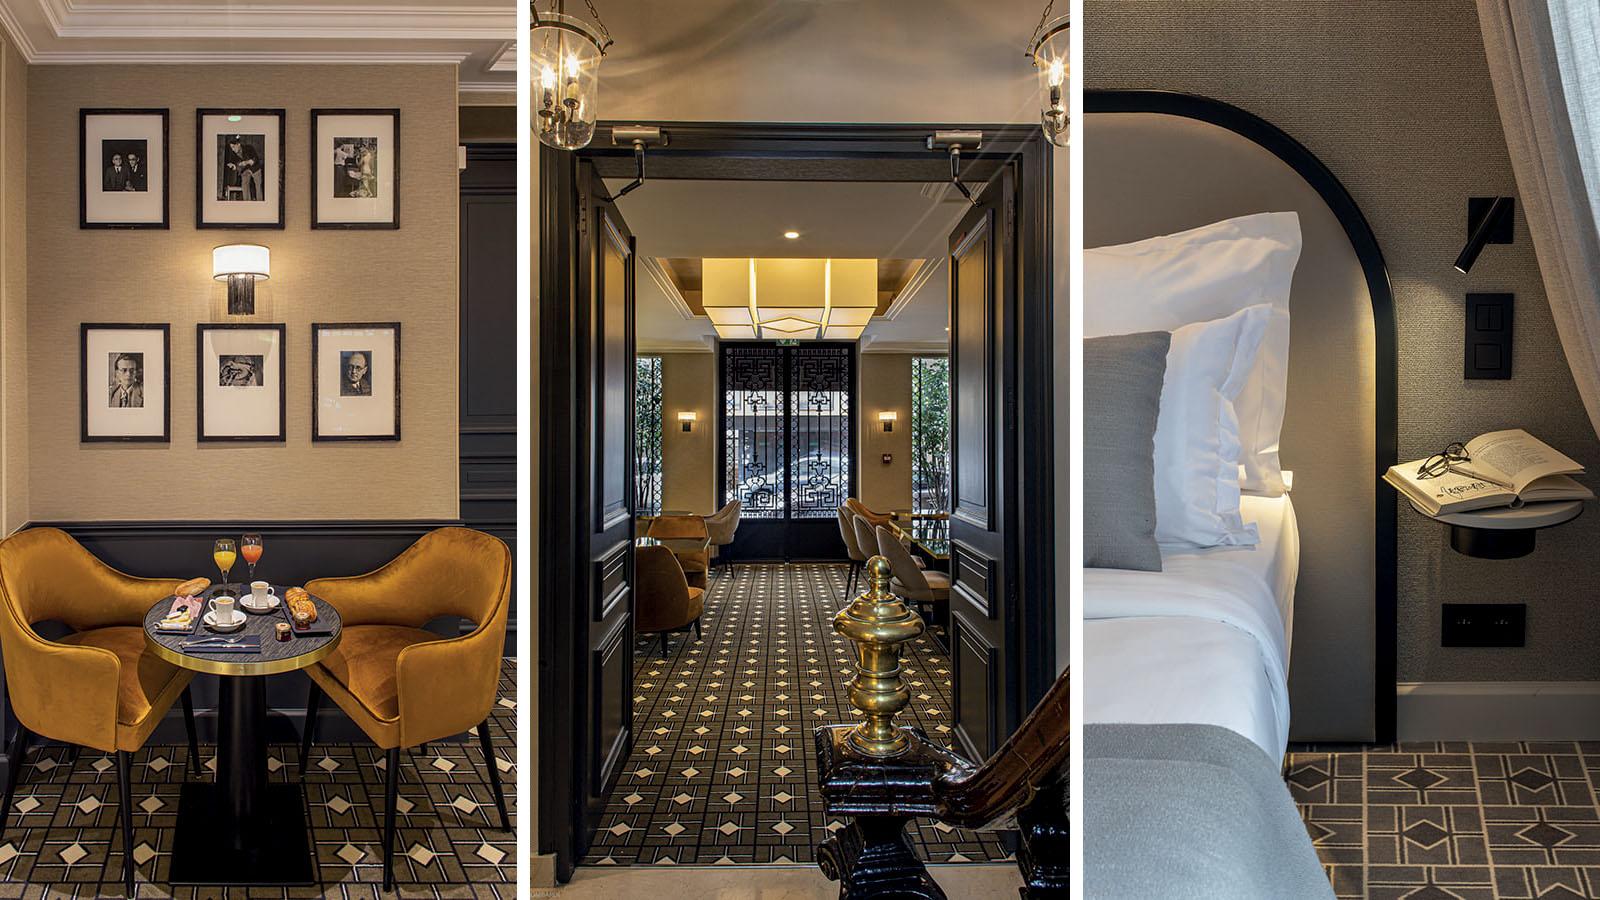 EFI Design Hotel Lenox Paris Efi Design 4 1374